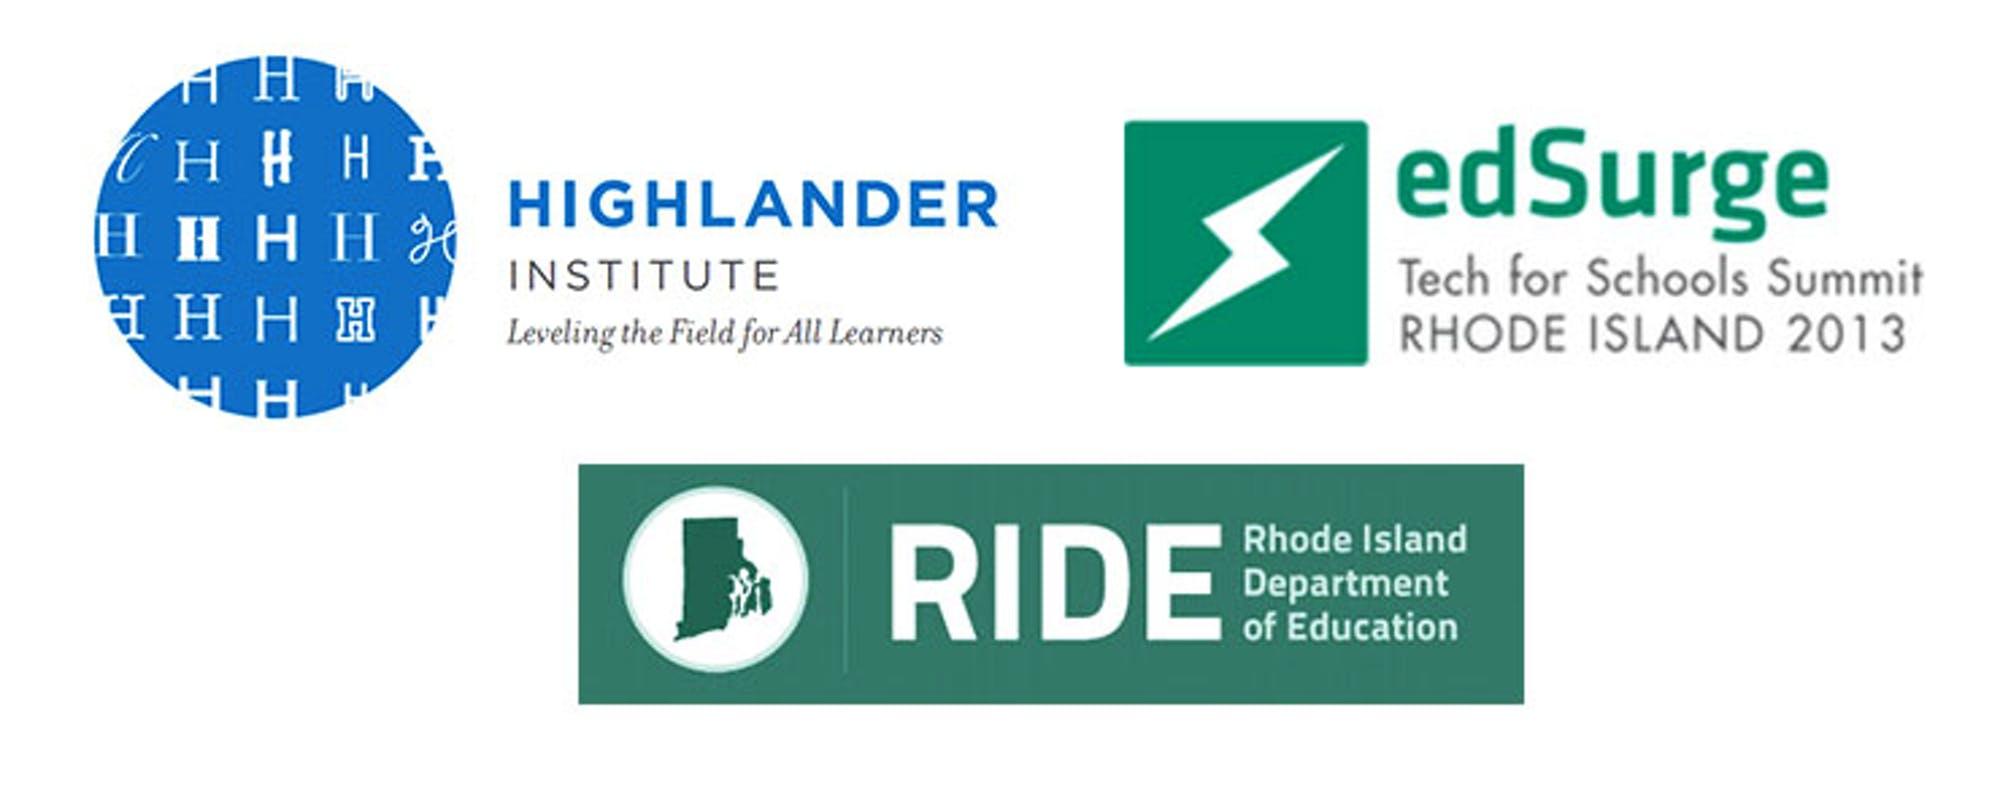 Rhode Island Rocks the Edtech Spectrum on October 5